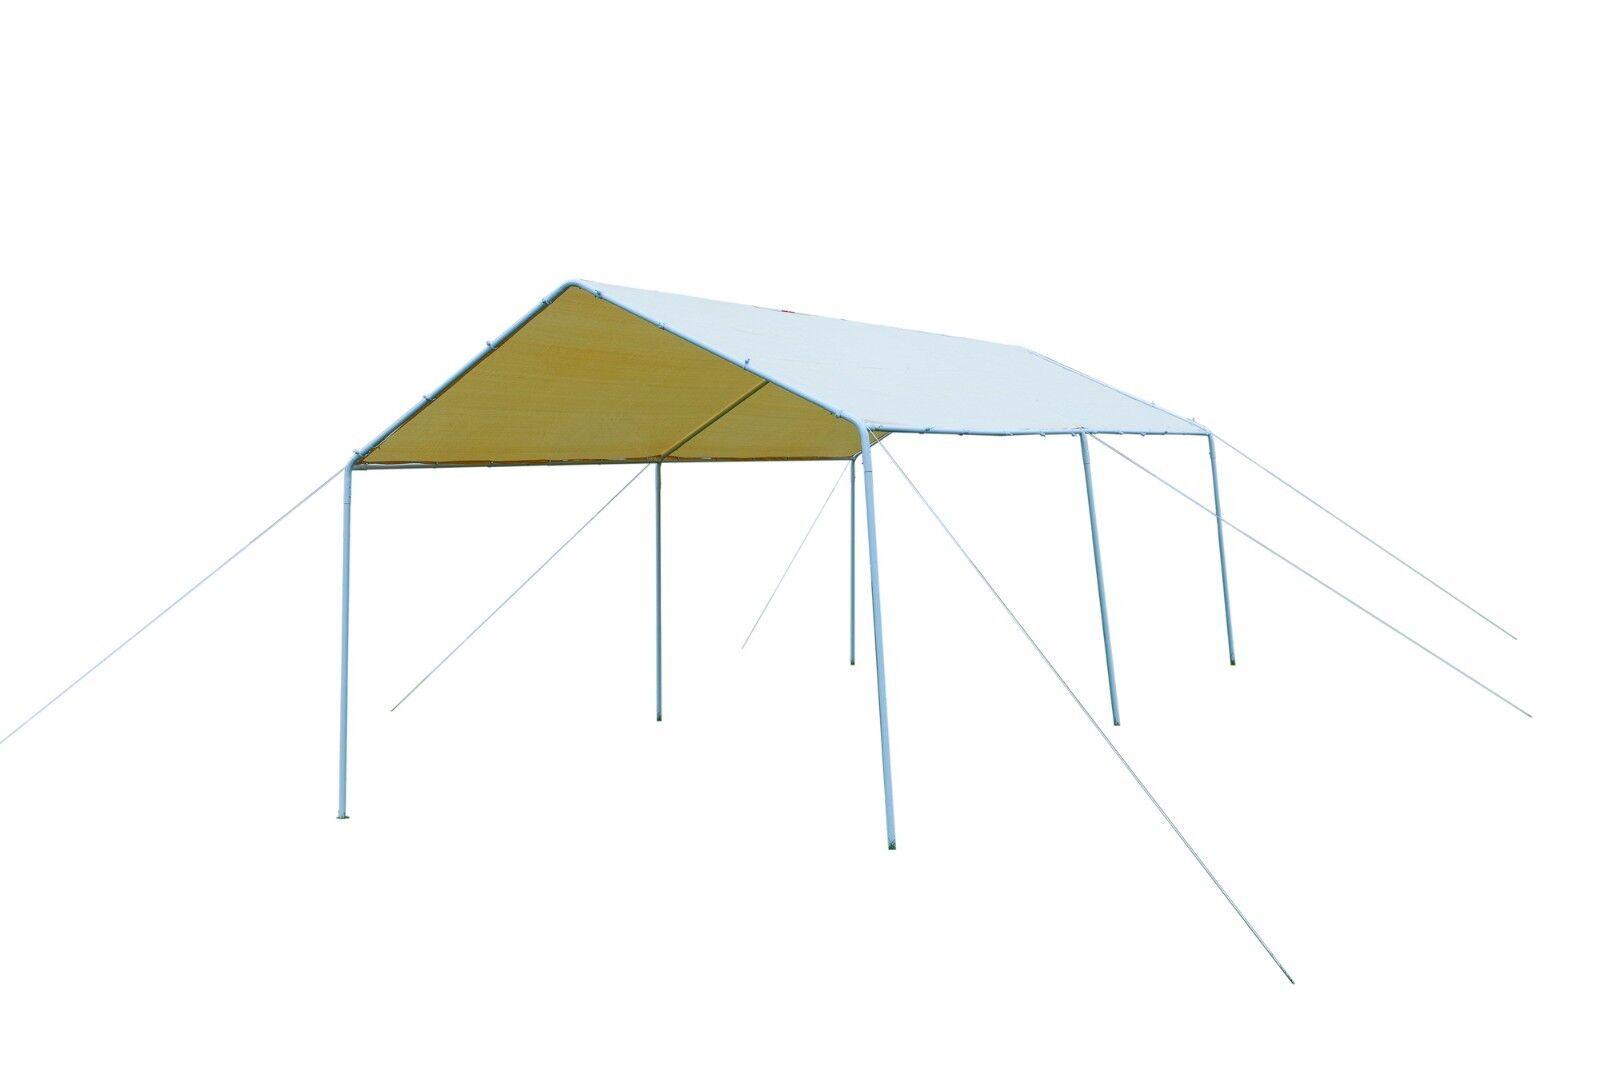 10x20 Carport Heavy Duty Metal Outdoor Canopy Garage Shelter